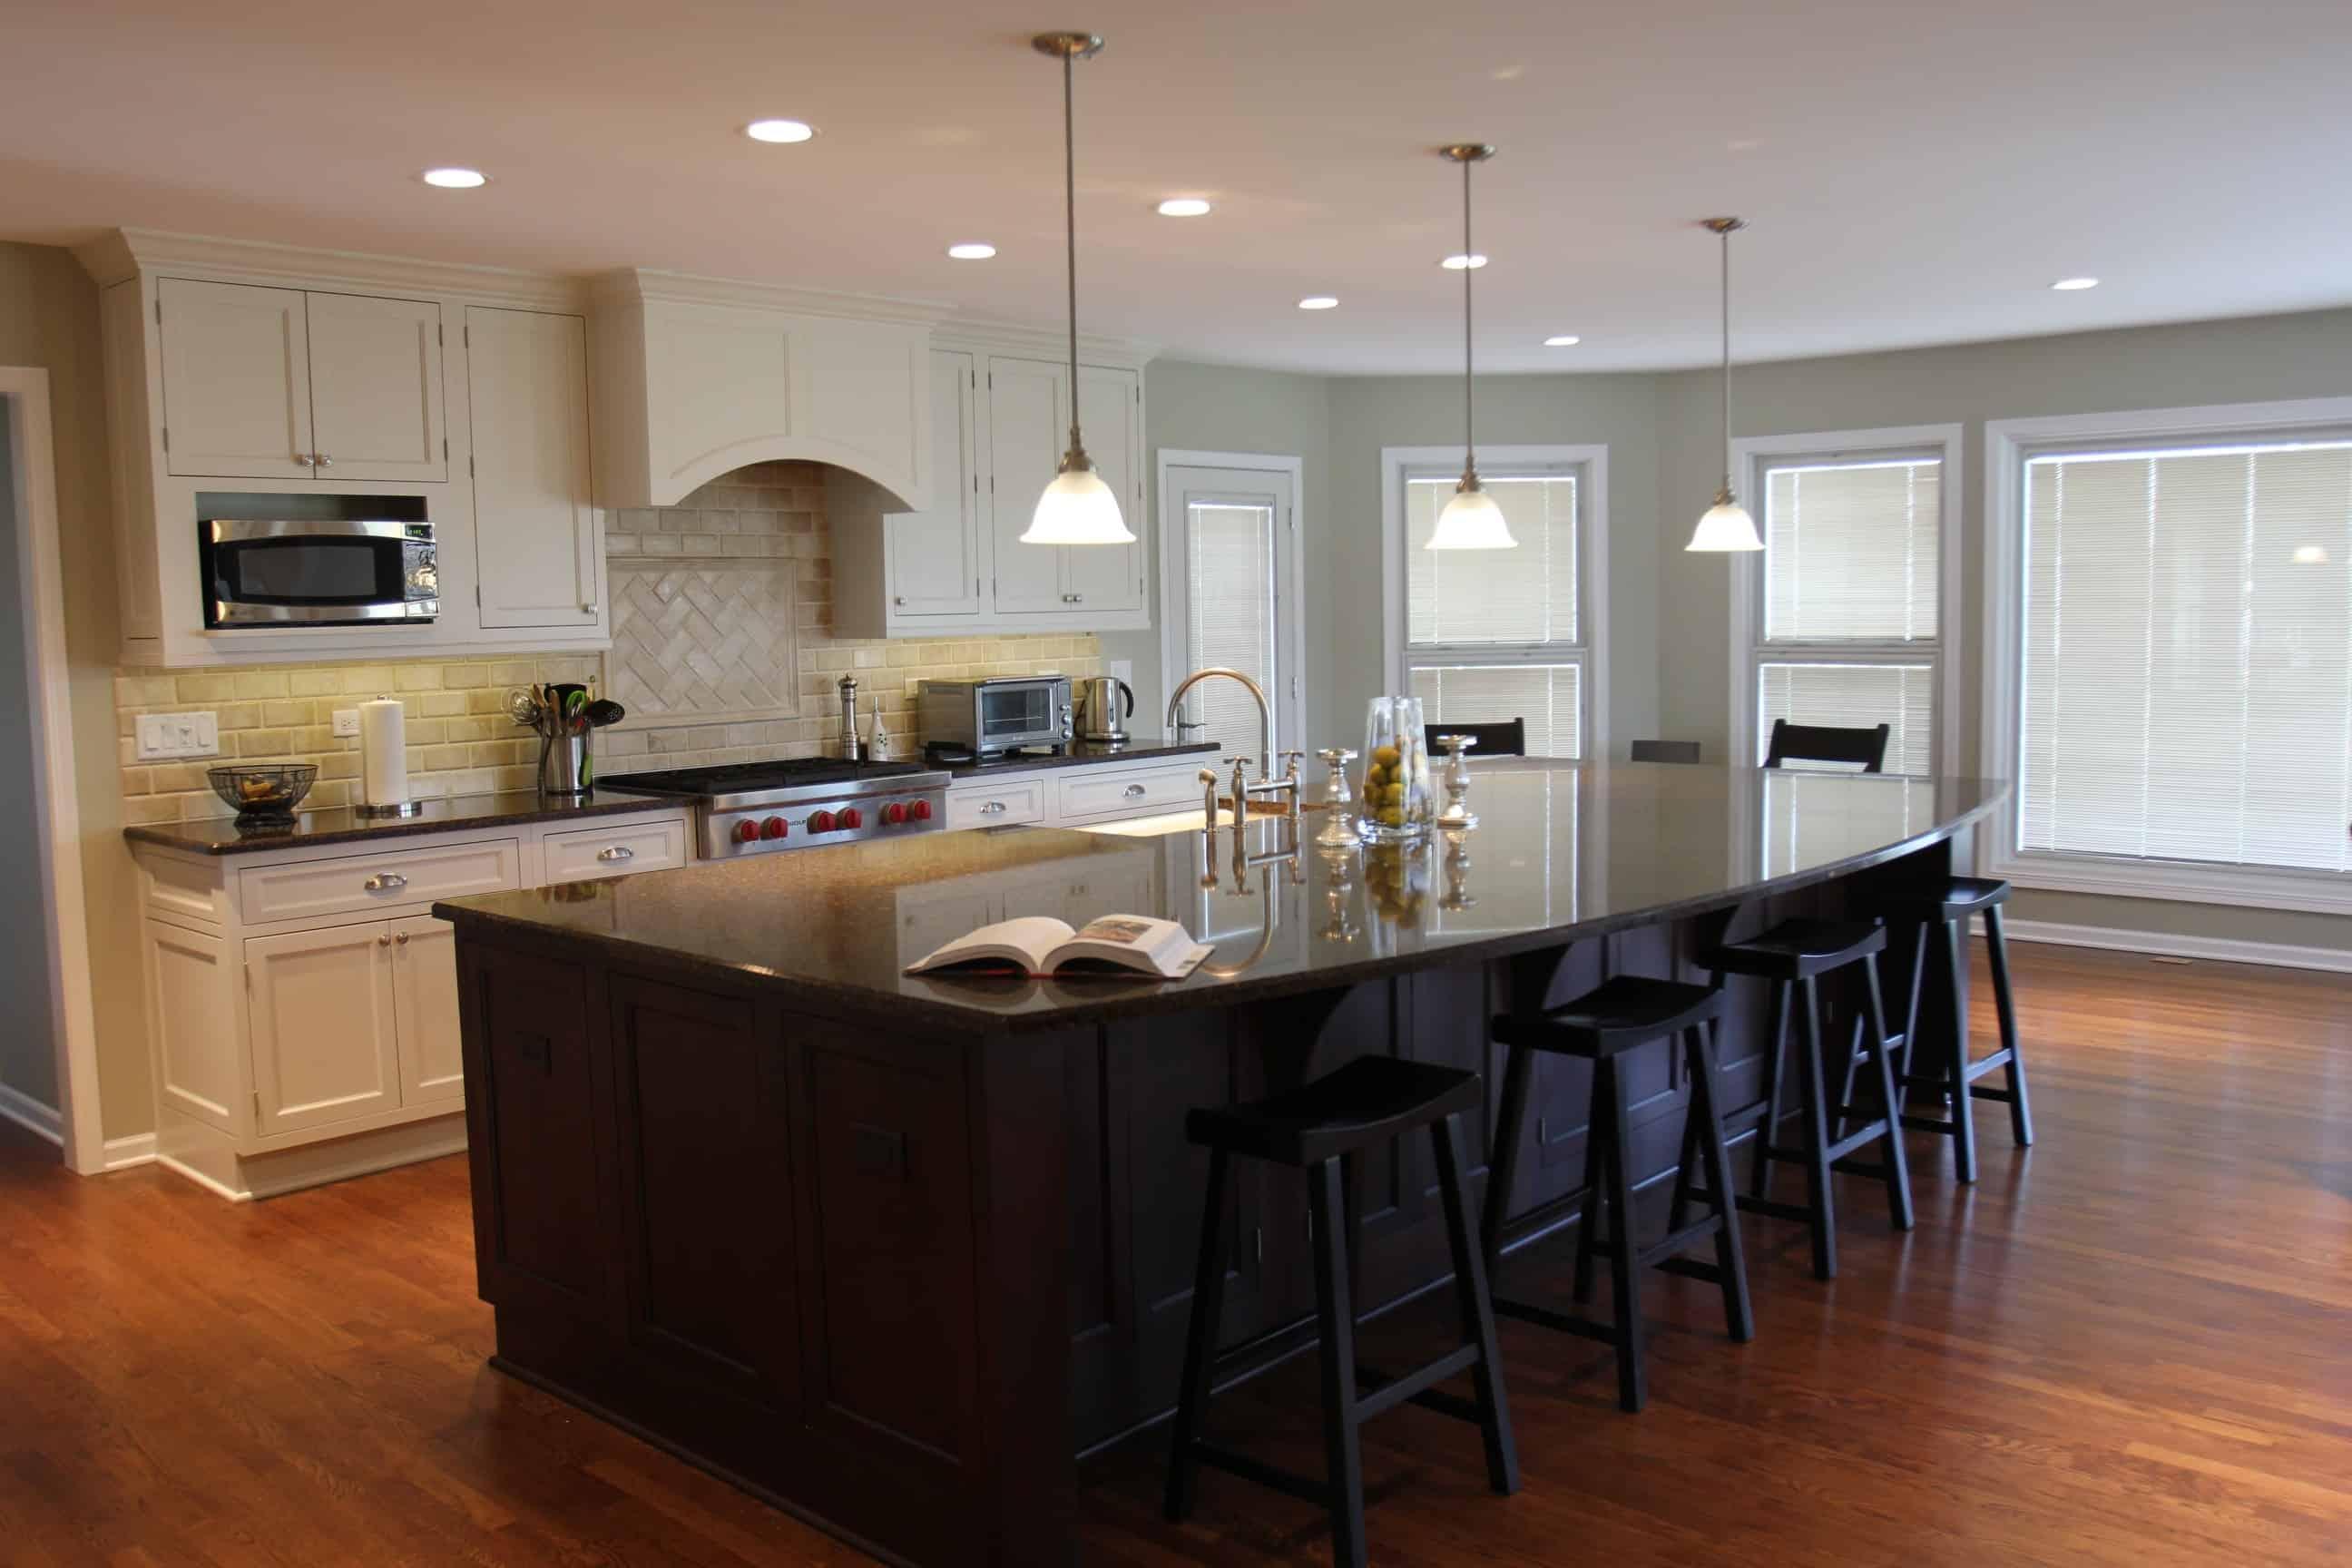 Beautiful-Appropiate-Industrial-Kitchen-Island-Seating-Globe-Mini-Pendant-Lights-Over-Kitchen-Island-For-Small-Space-Has-Kitchen-Islands-With-Seating